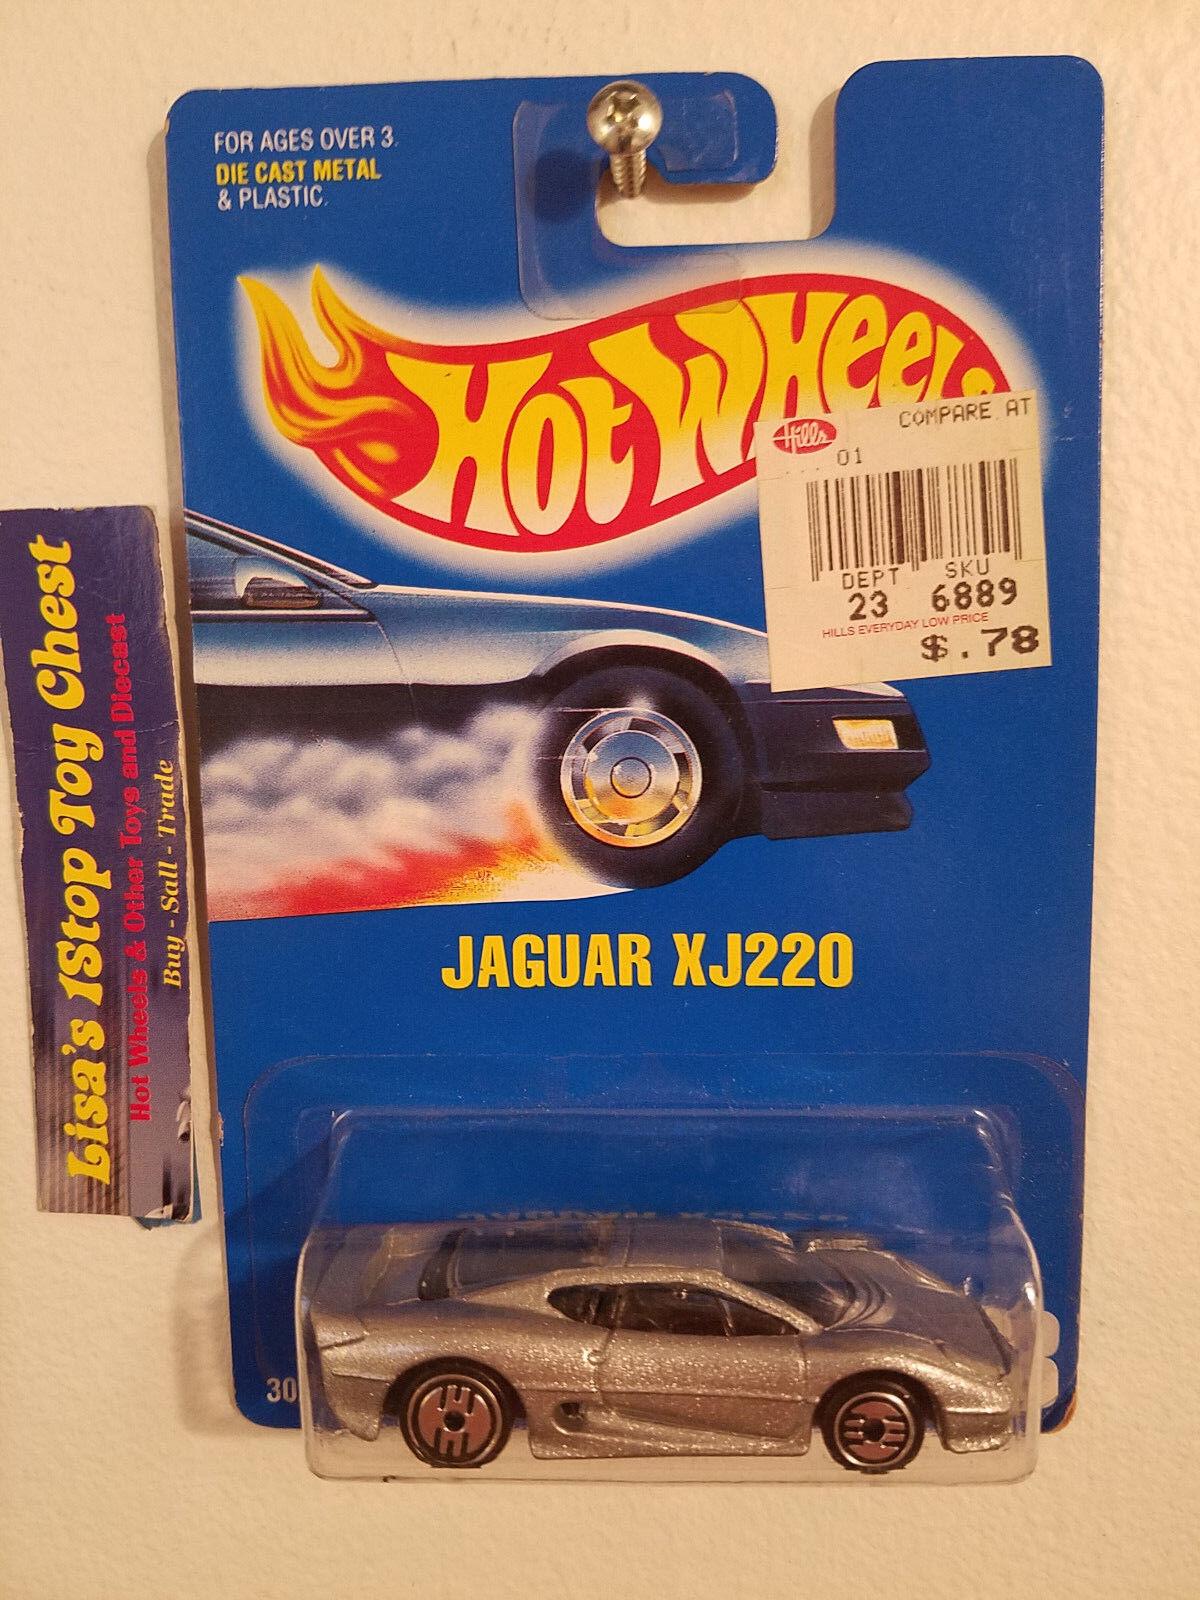 Jaguar Blue Card >> Hot Wheels 1992 Jaguar Xj220 Blue Card 203 B18 Ebay